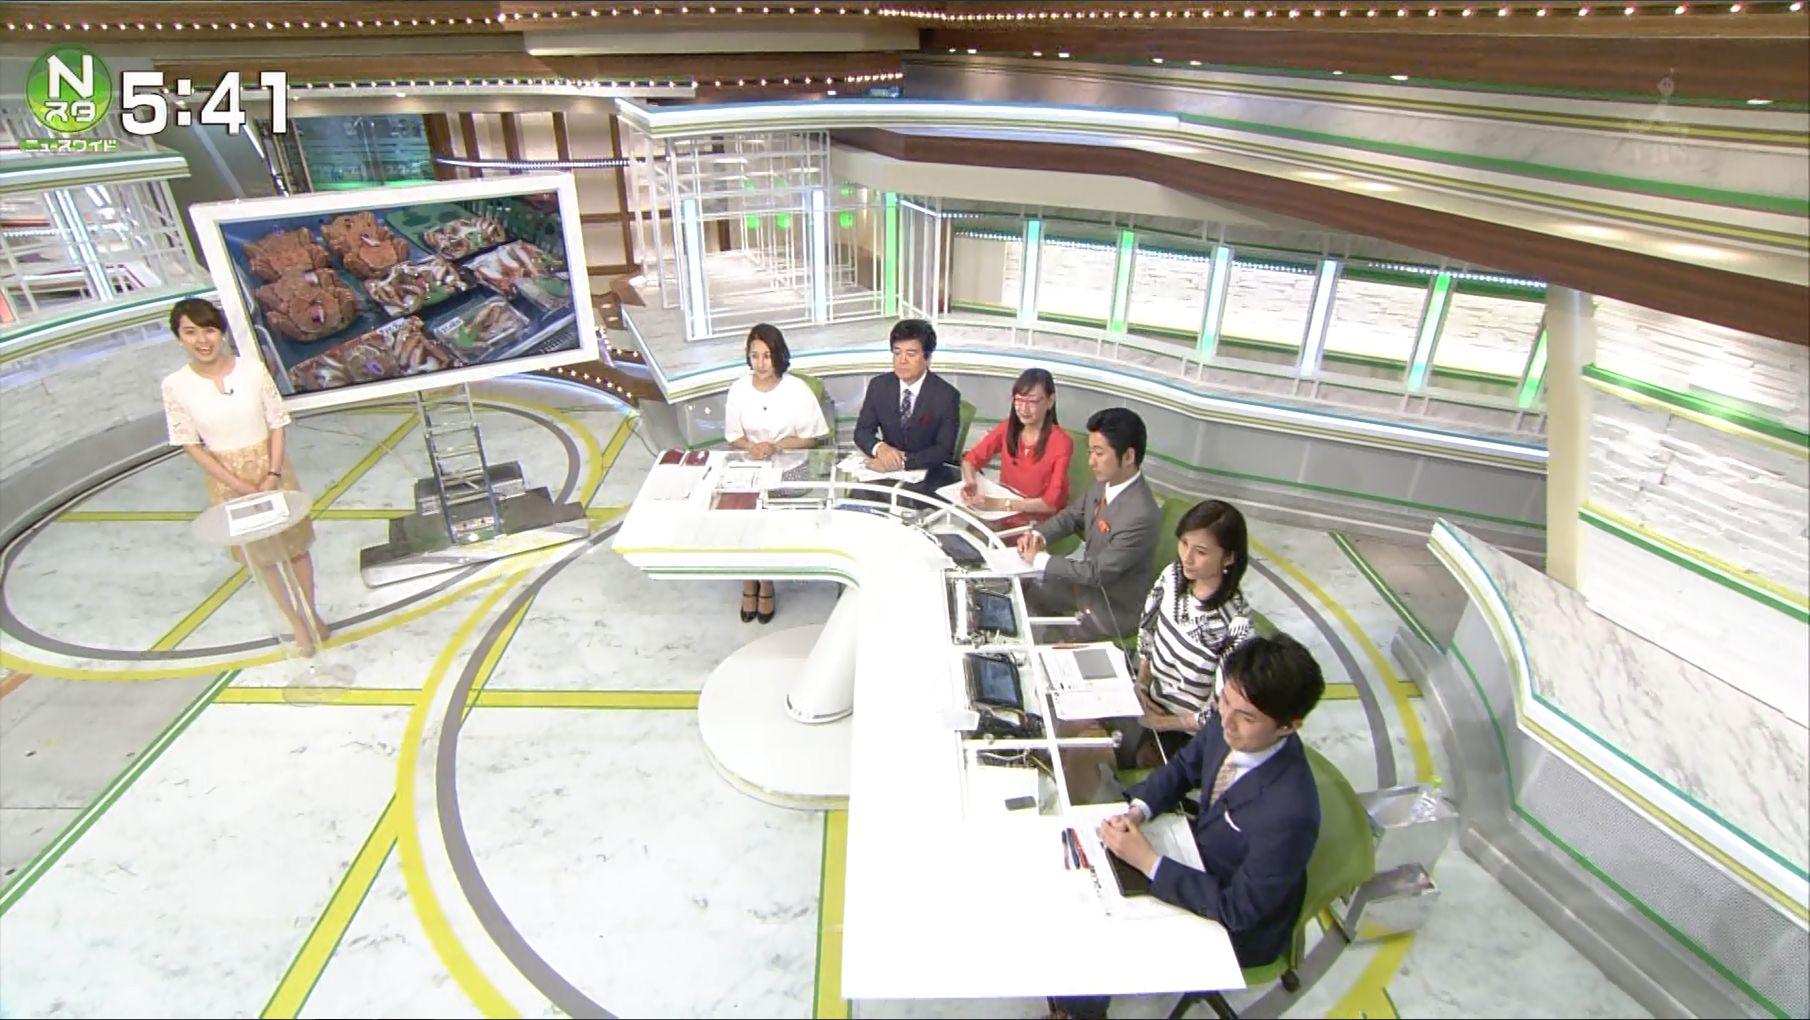 TBS☆佐藤渚 Part11☆あさチャン! 歴史列伝 [無断転載禁止]©2ch.netdailymotion>1本 ->画像>875枚